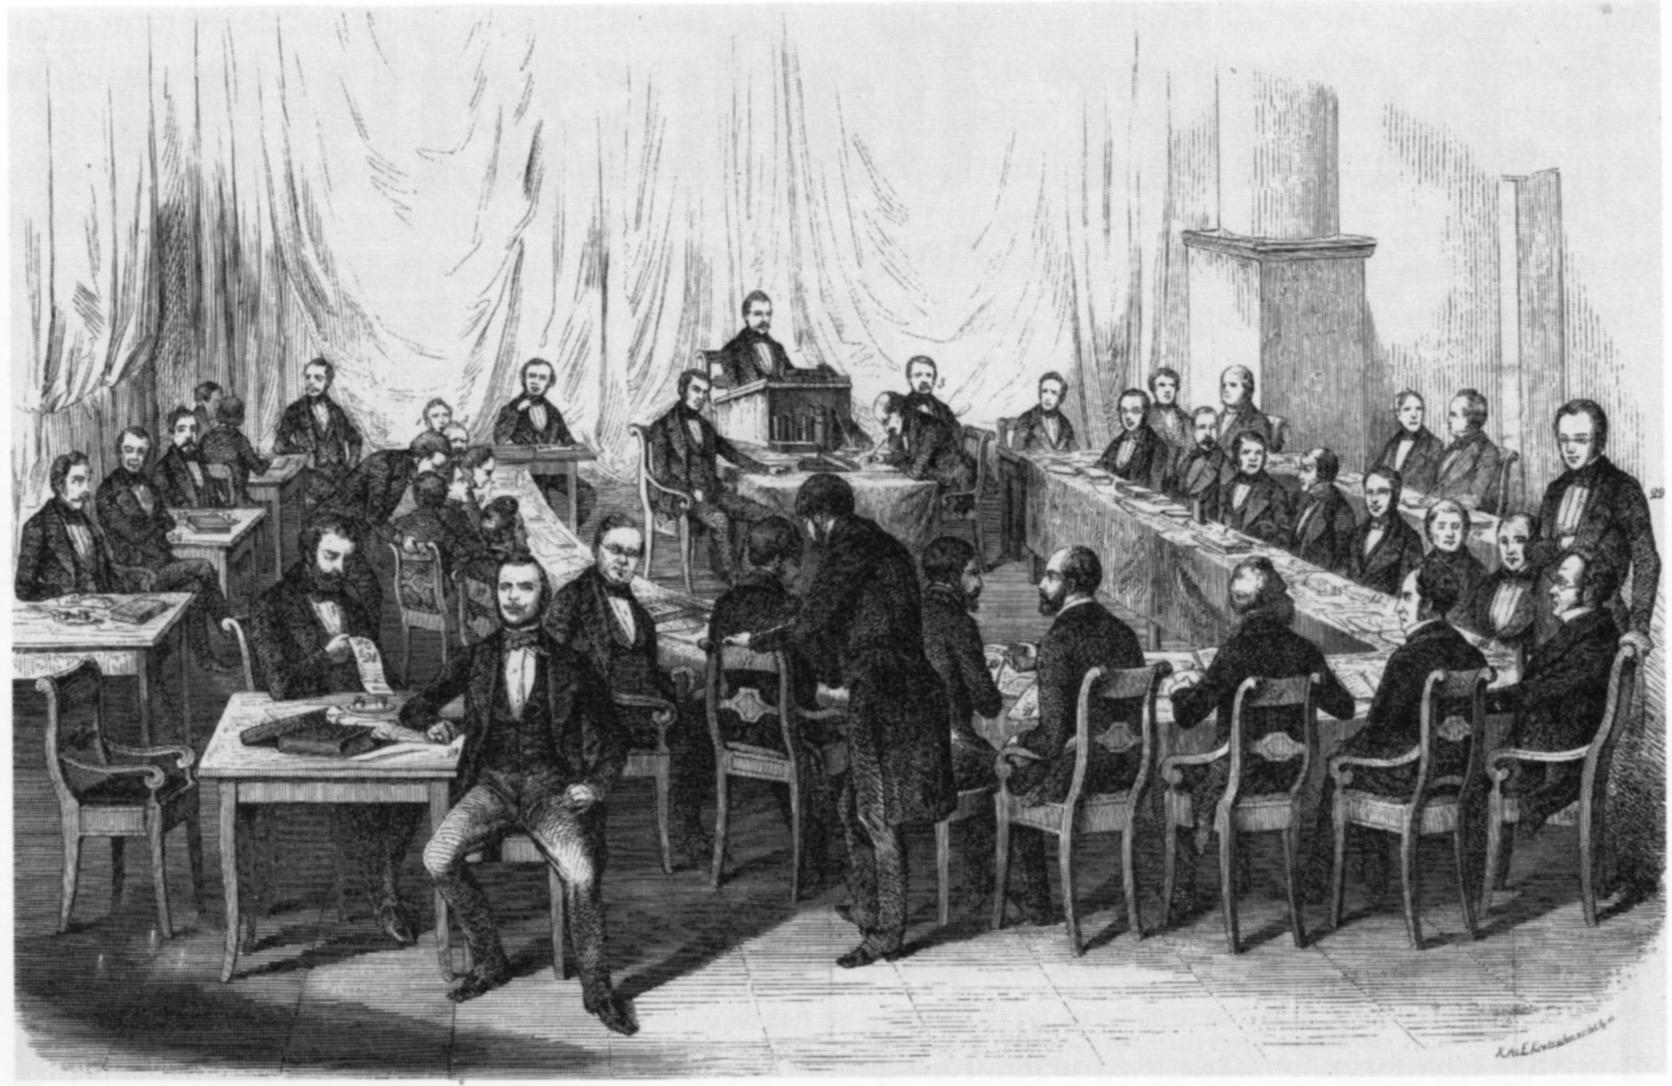 File:Letzte Tagsatzung 20 10 1847.jpg